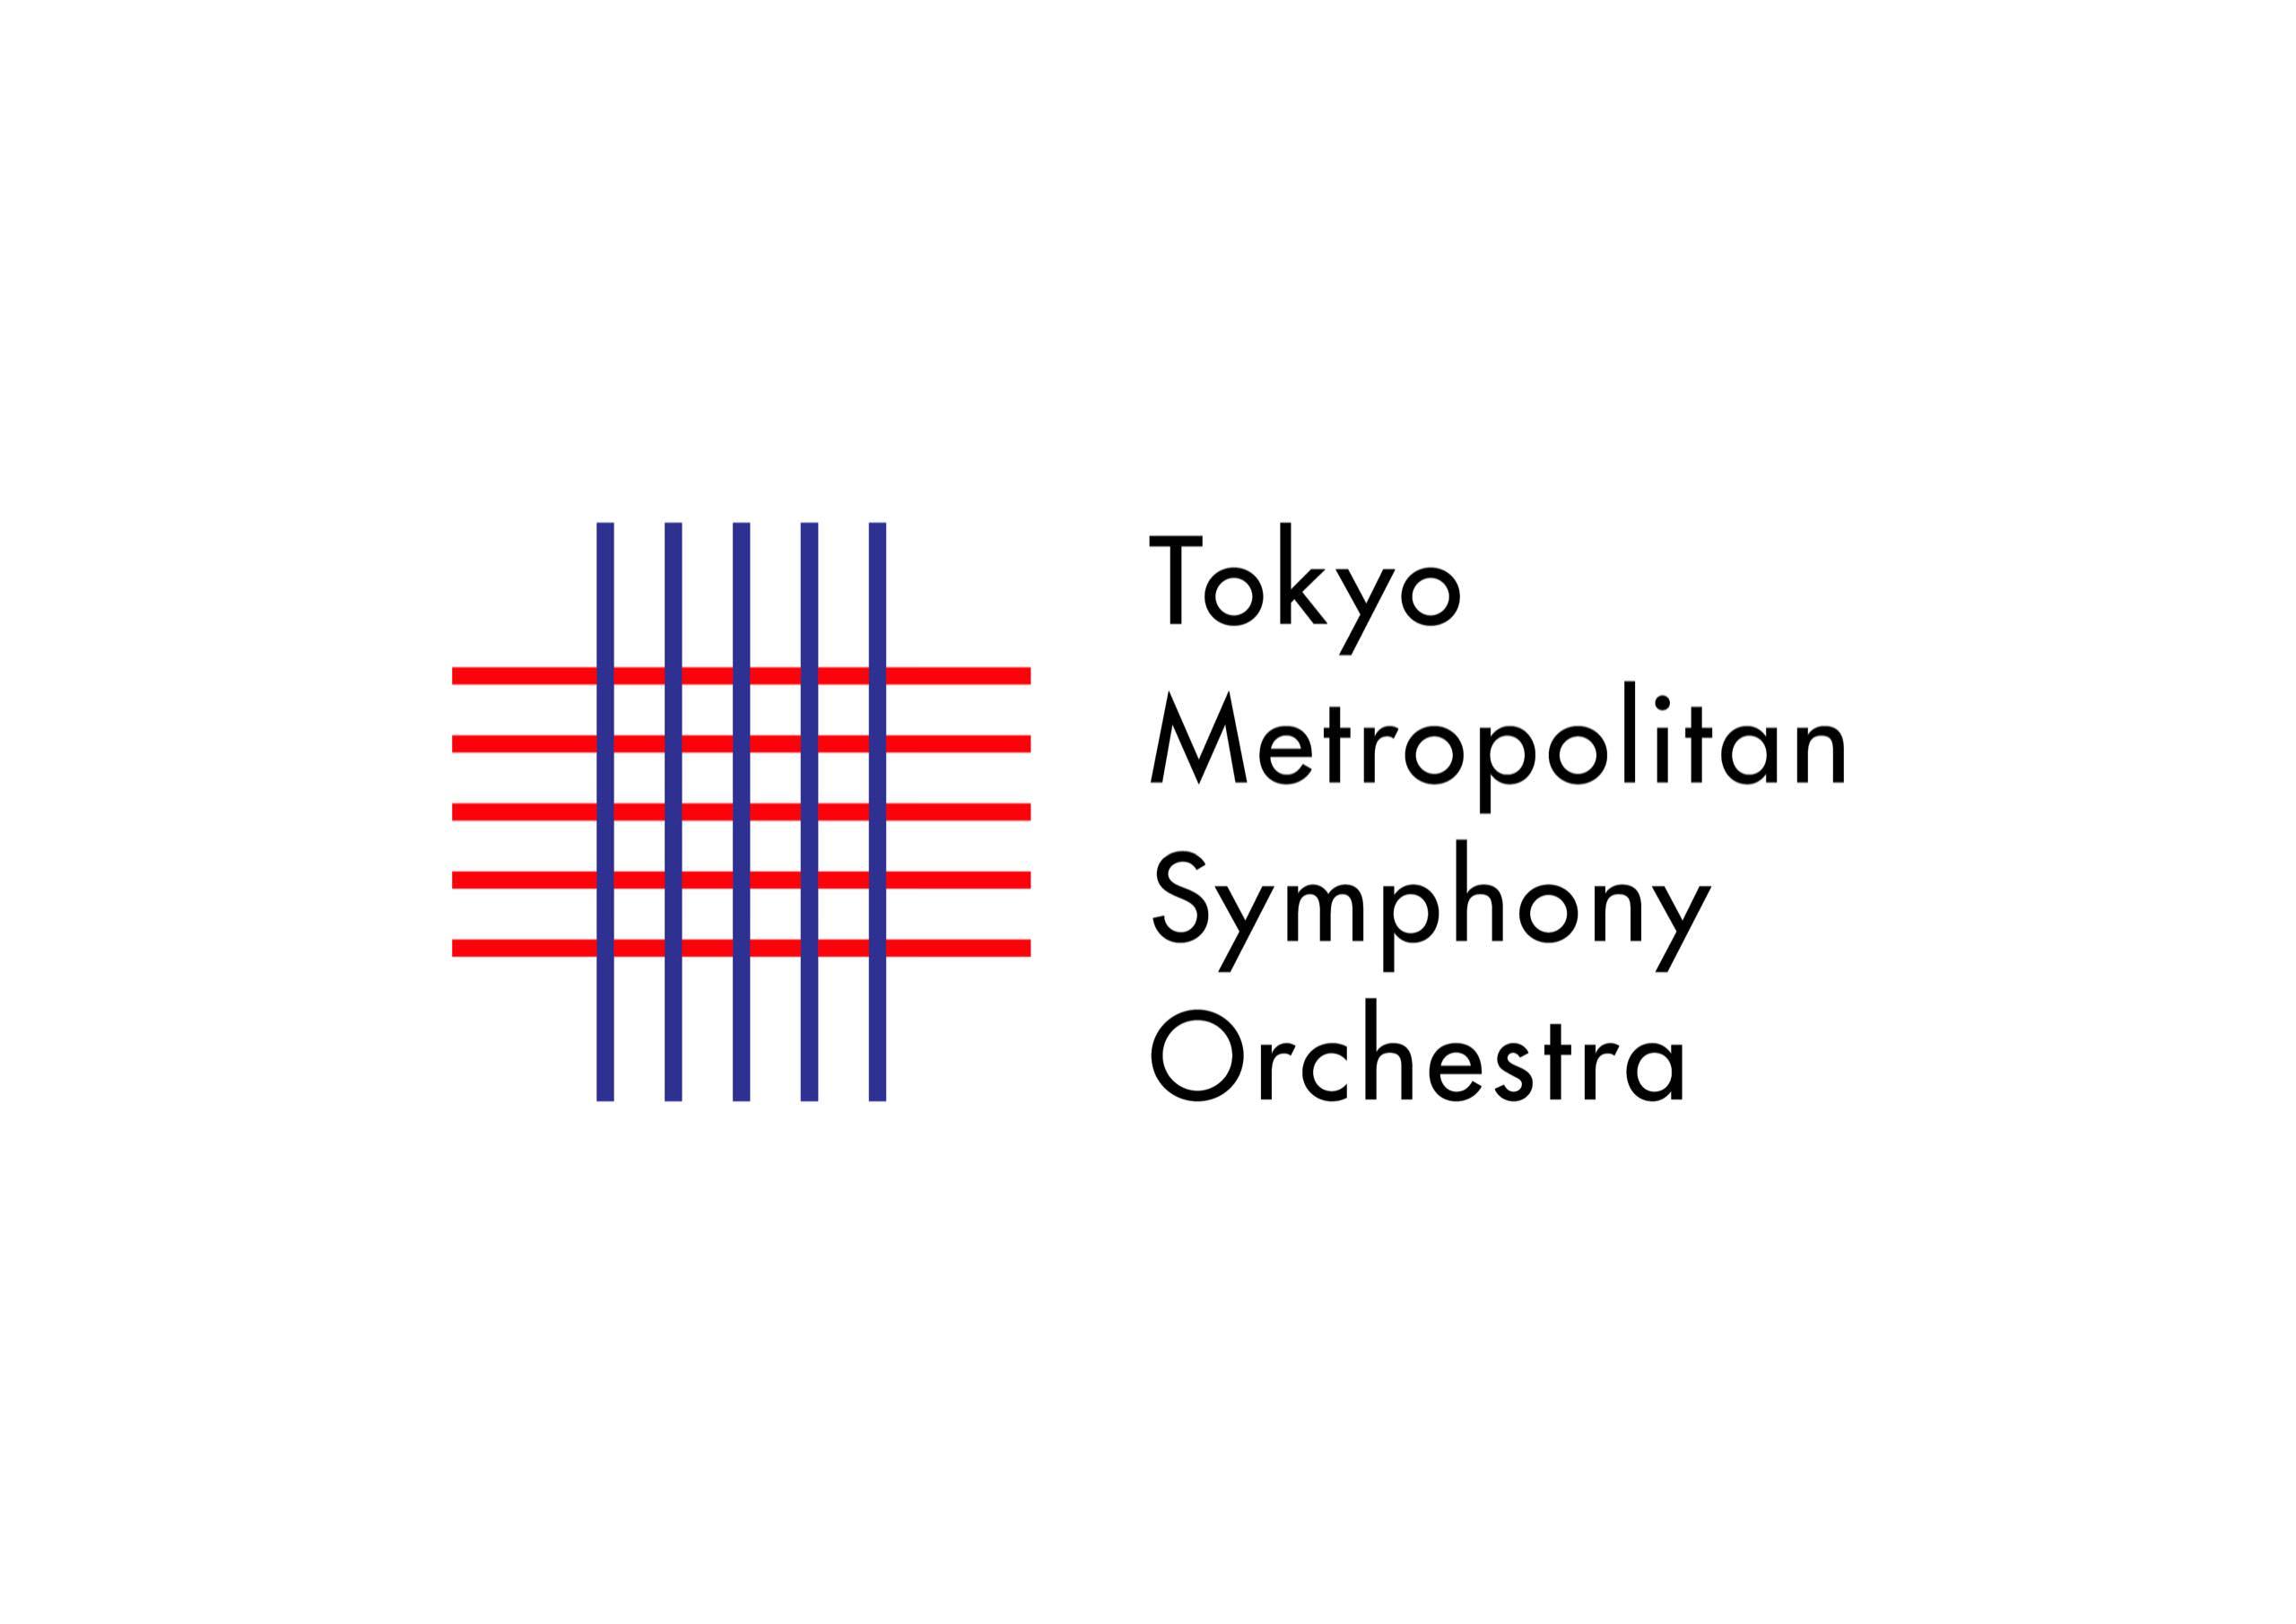 TOKYO METROPOLITAN SYMPHONY ORCHESTRA